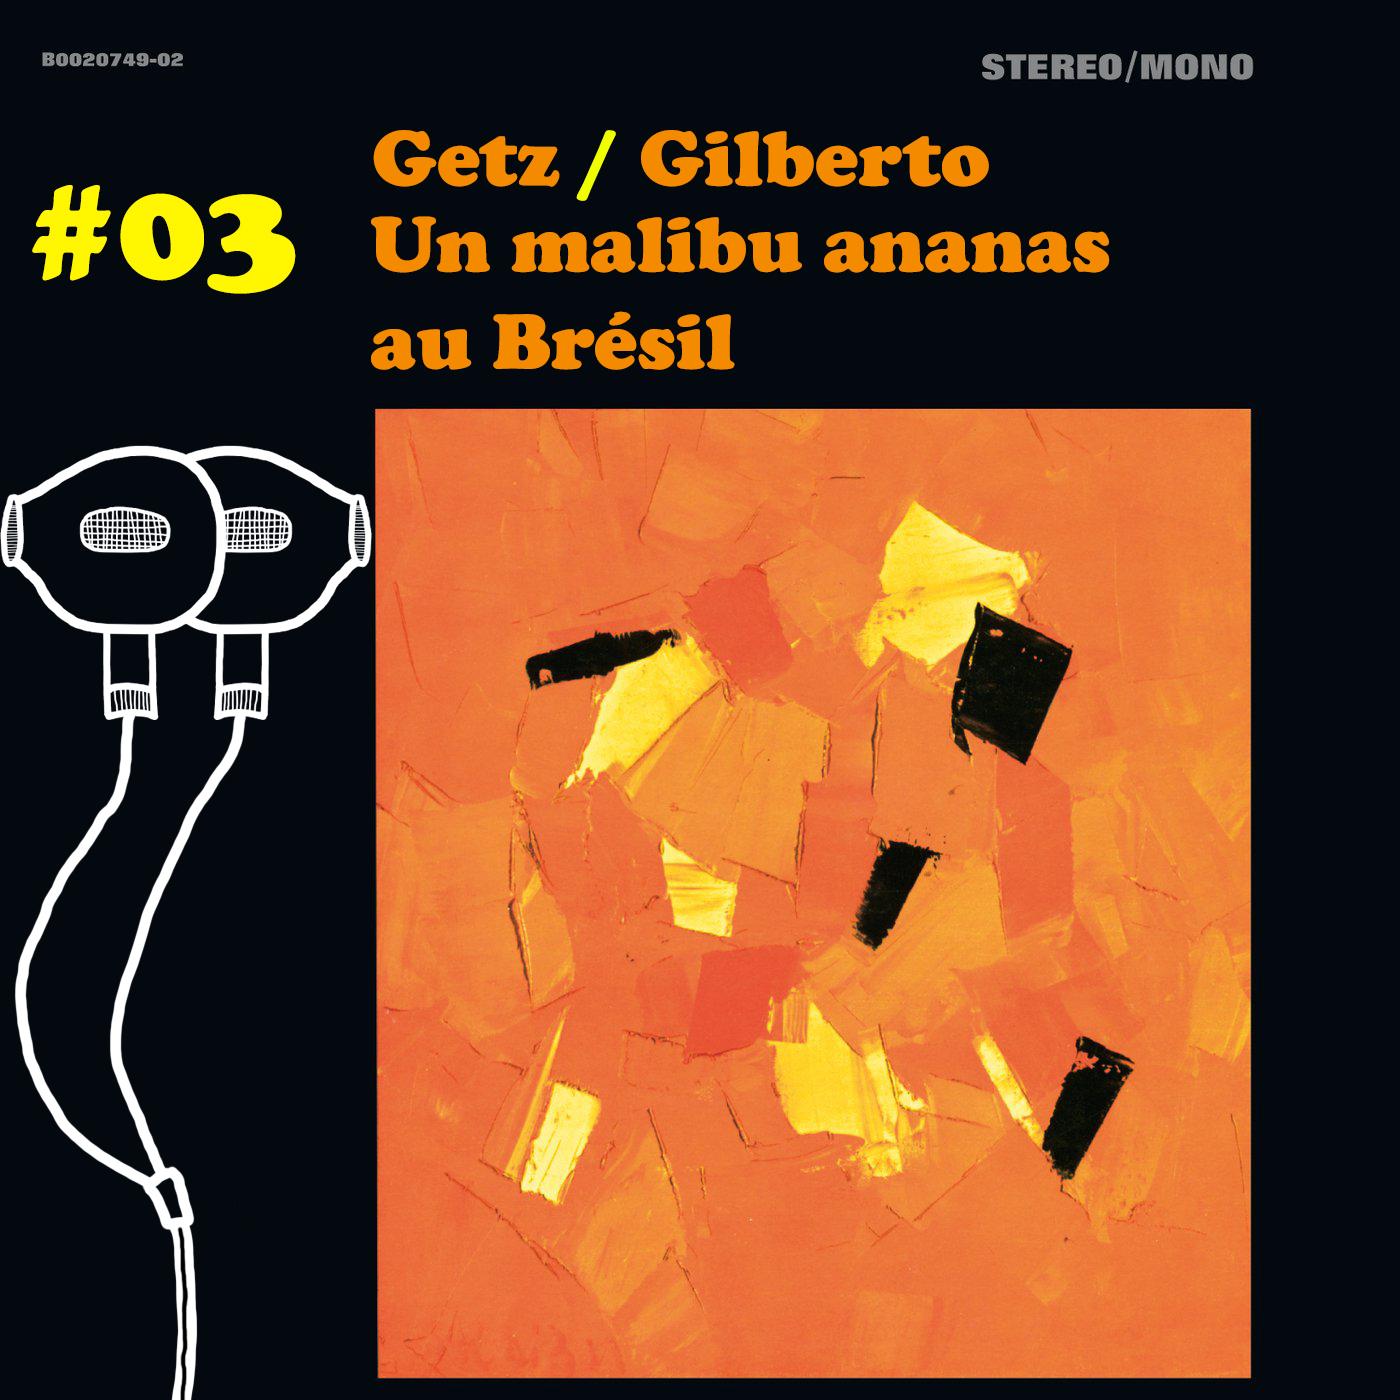 J'y comprends rien mais j'aime bien – #03 – Getz/Gilberto : Un malibu ananas au Brésil